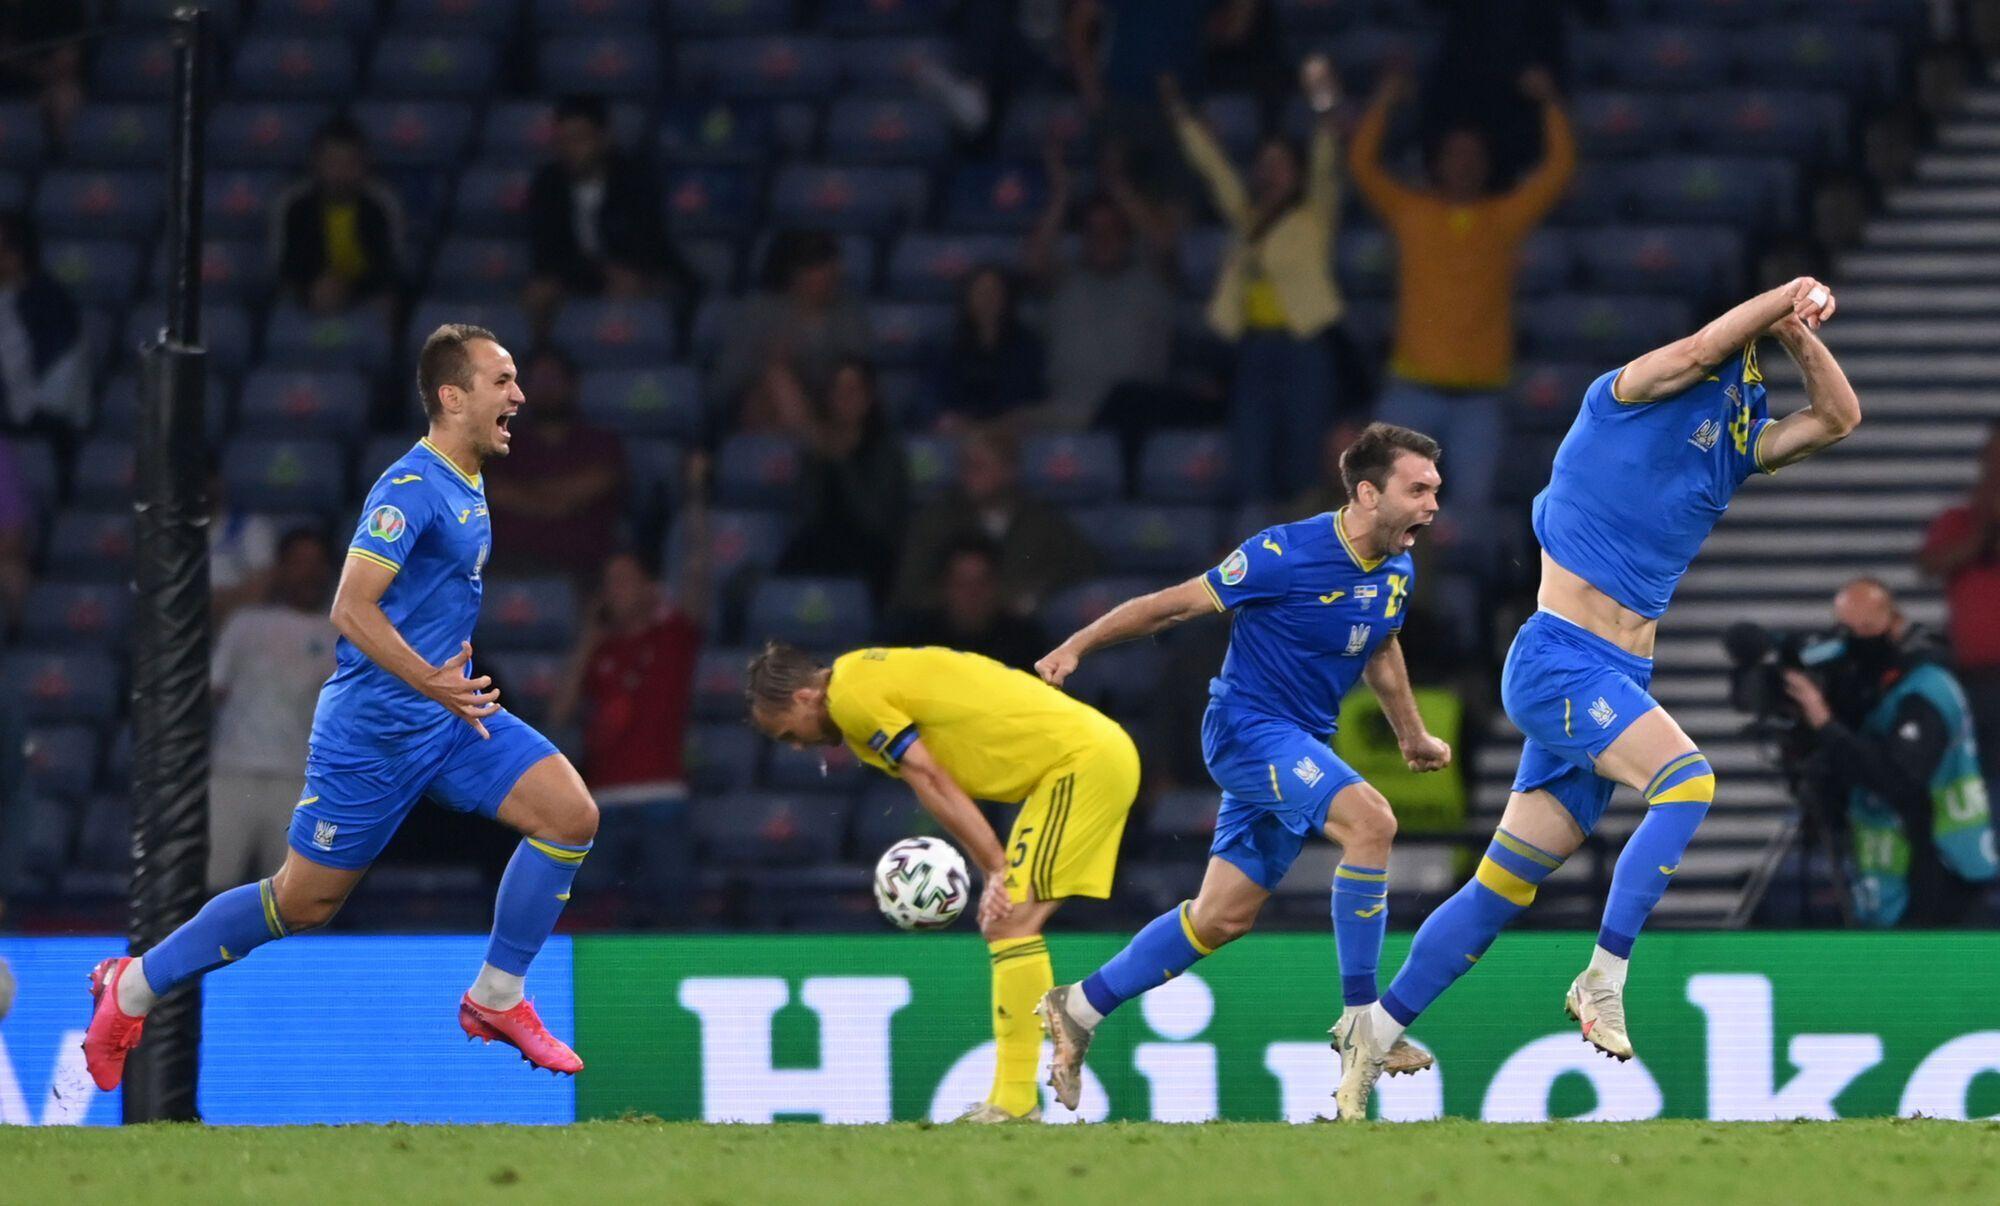 Швеция - Украина - Евро-2020: 1/8 финала